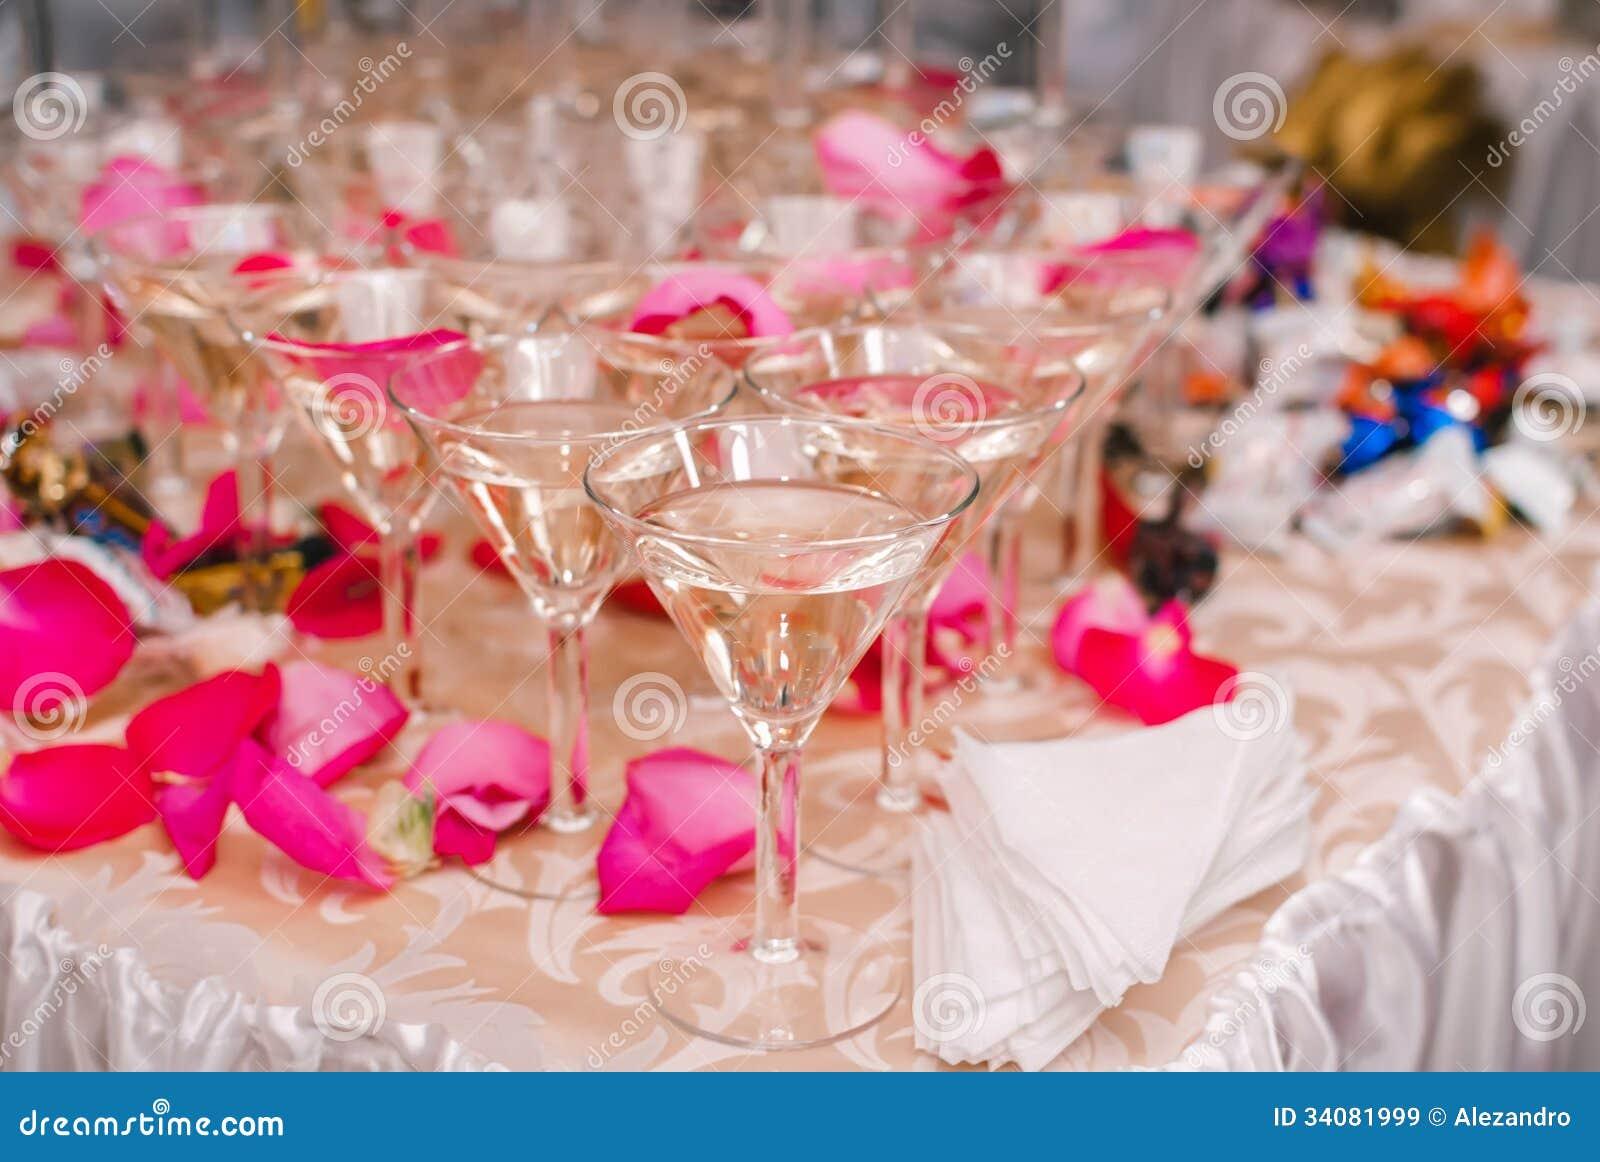 Martini Glass Pyramid stock image. Image of alcohol, drink - 34081999